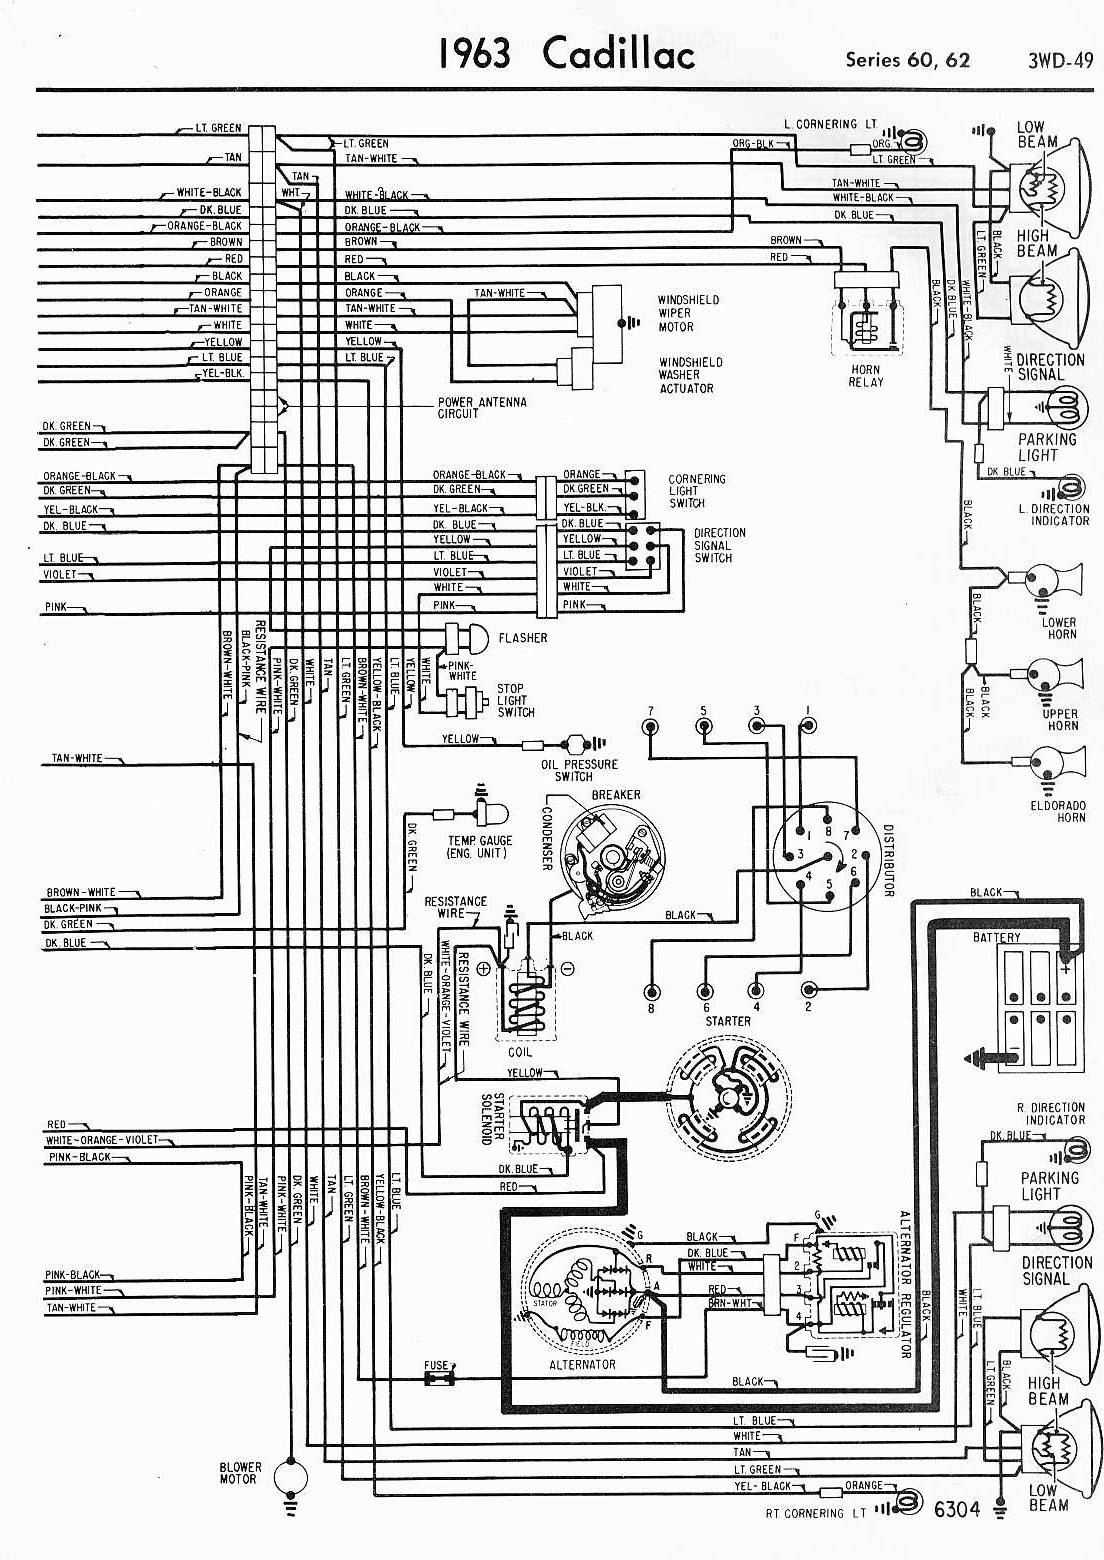 Cadillac Wiring Diagrams - DIY Enthusiasts Wiring Diagrams •